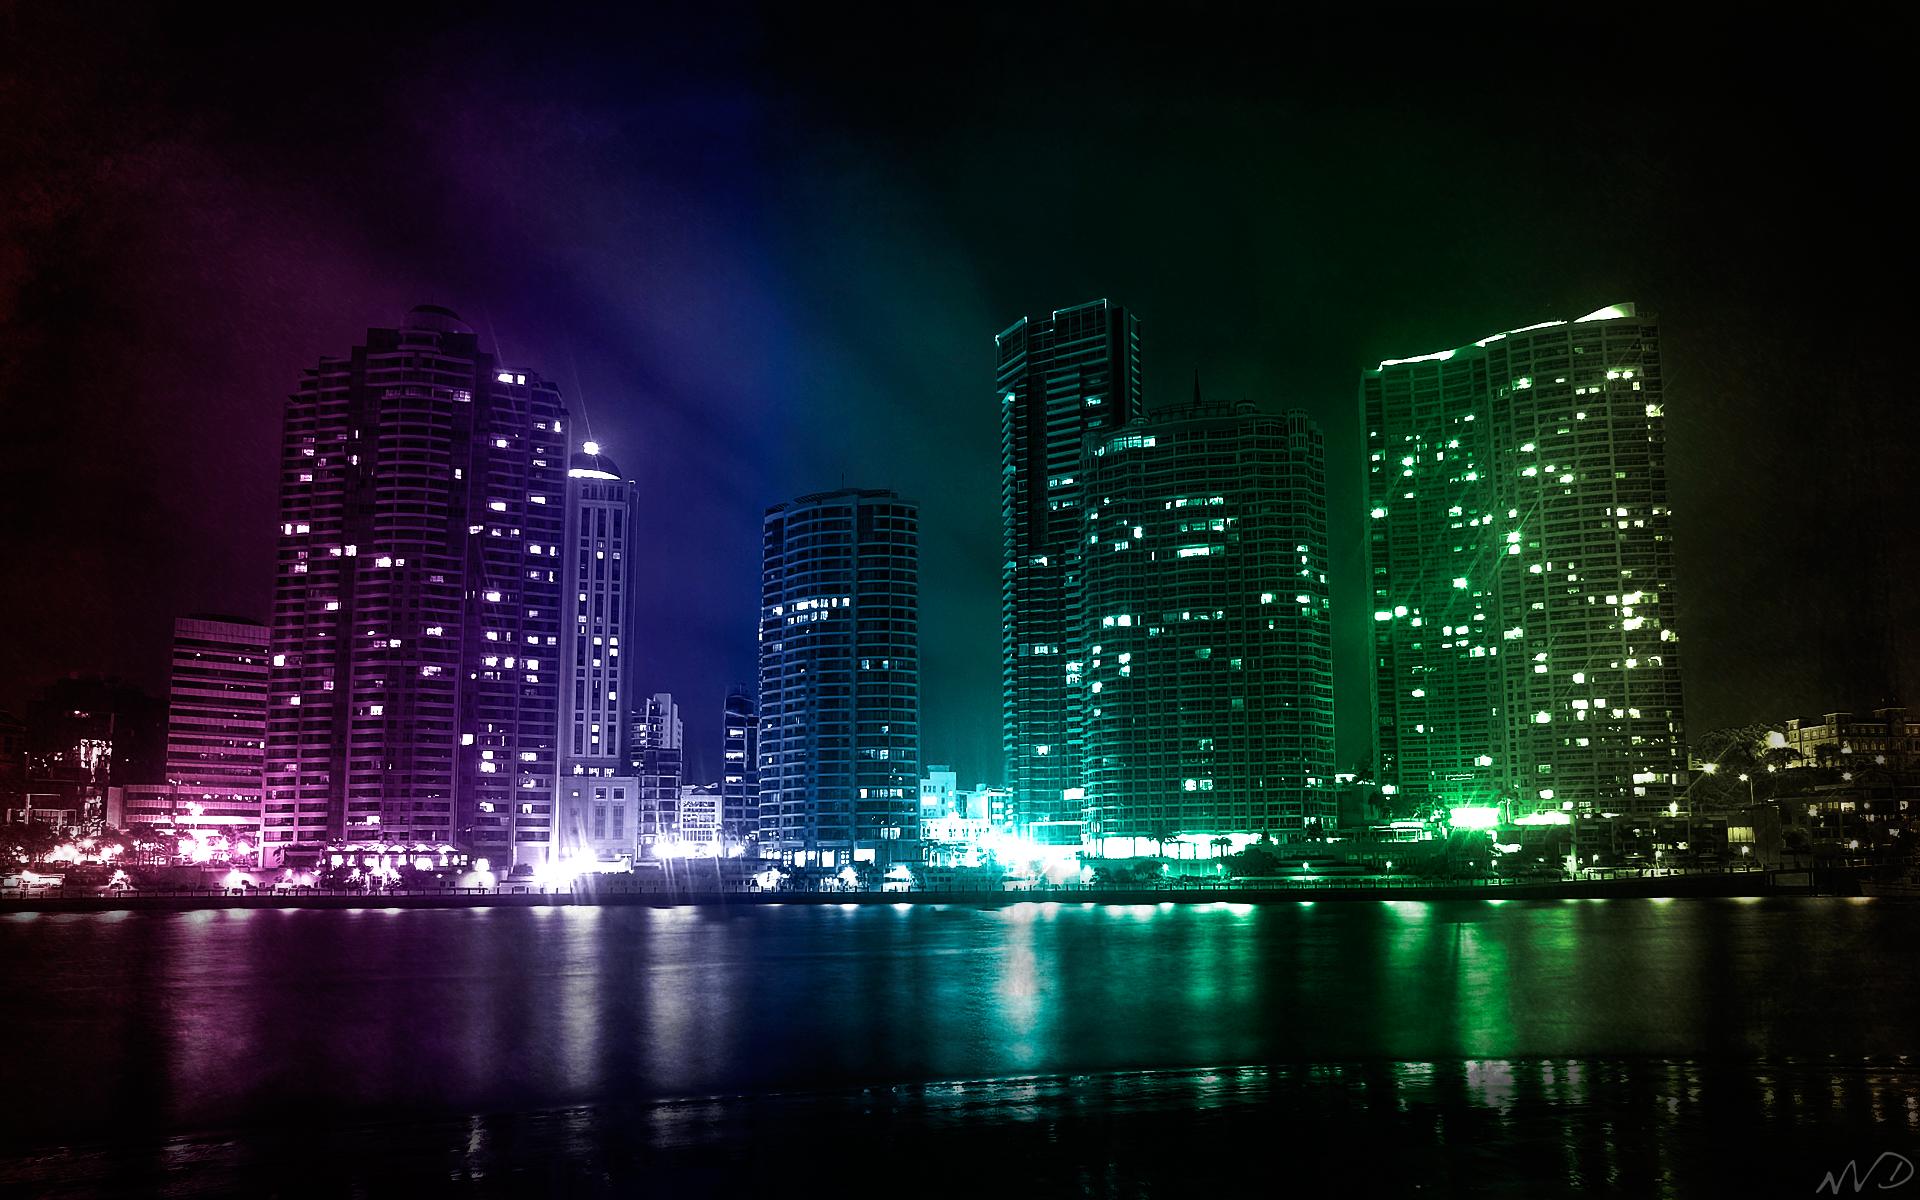 City Lights HD Wallpapers 1080p 1920x1200